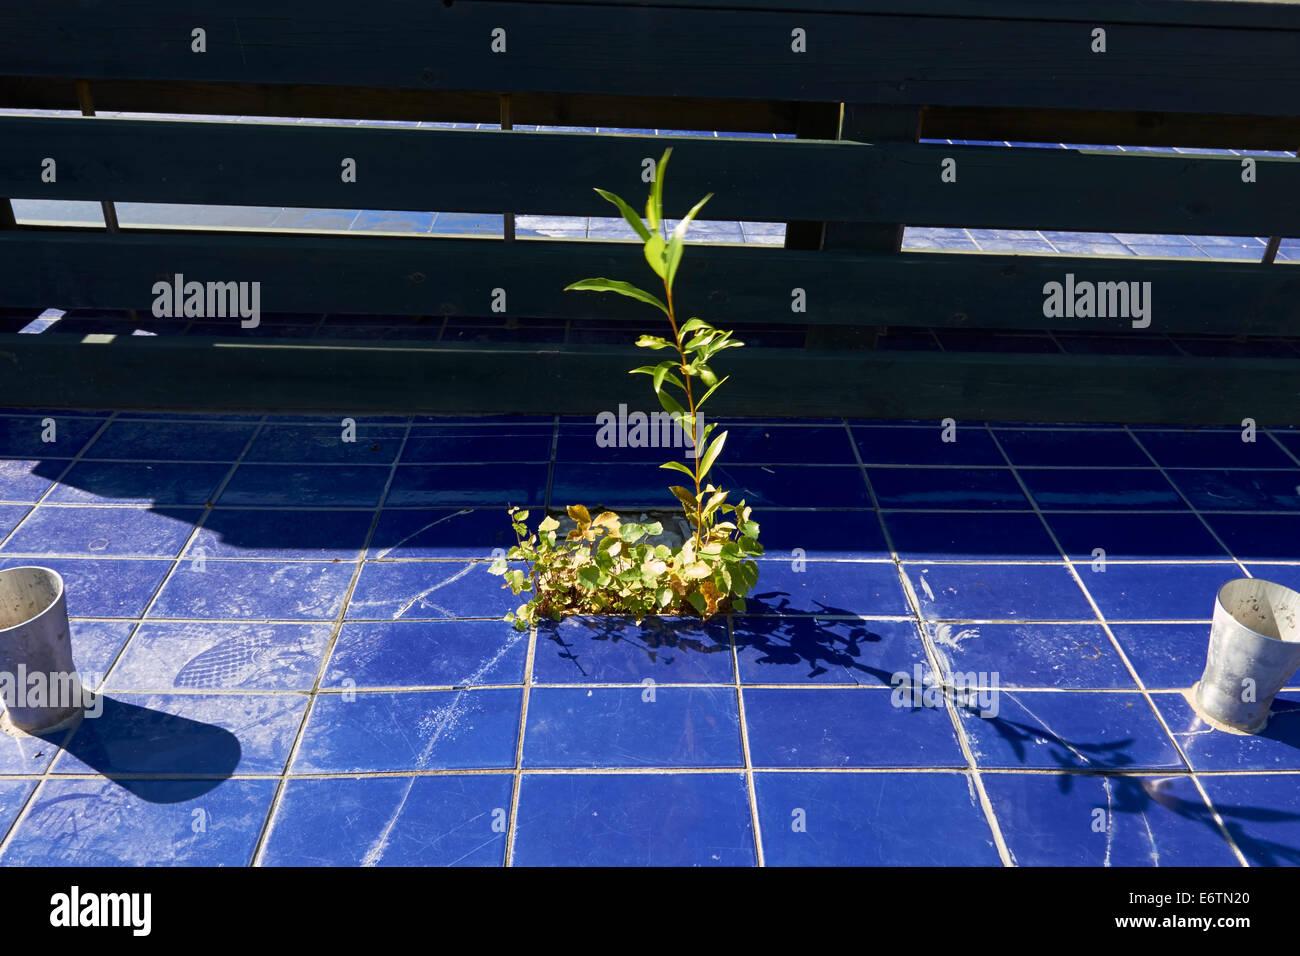 vegetation in an unused pool - Stock Image